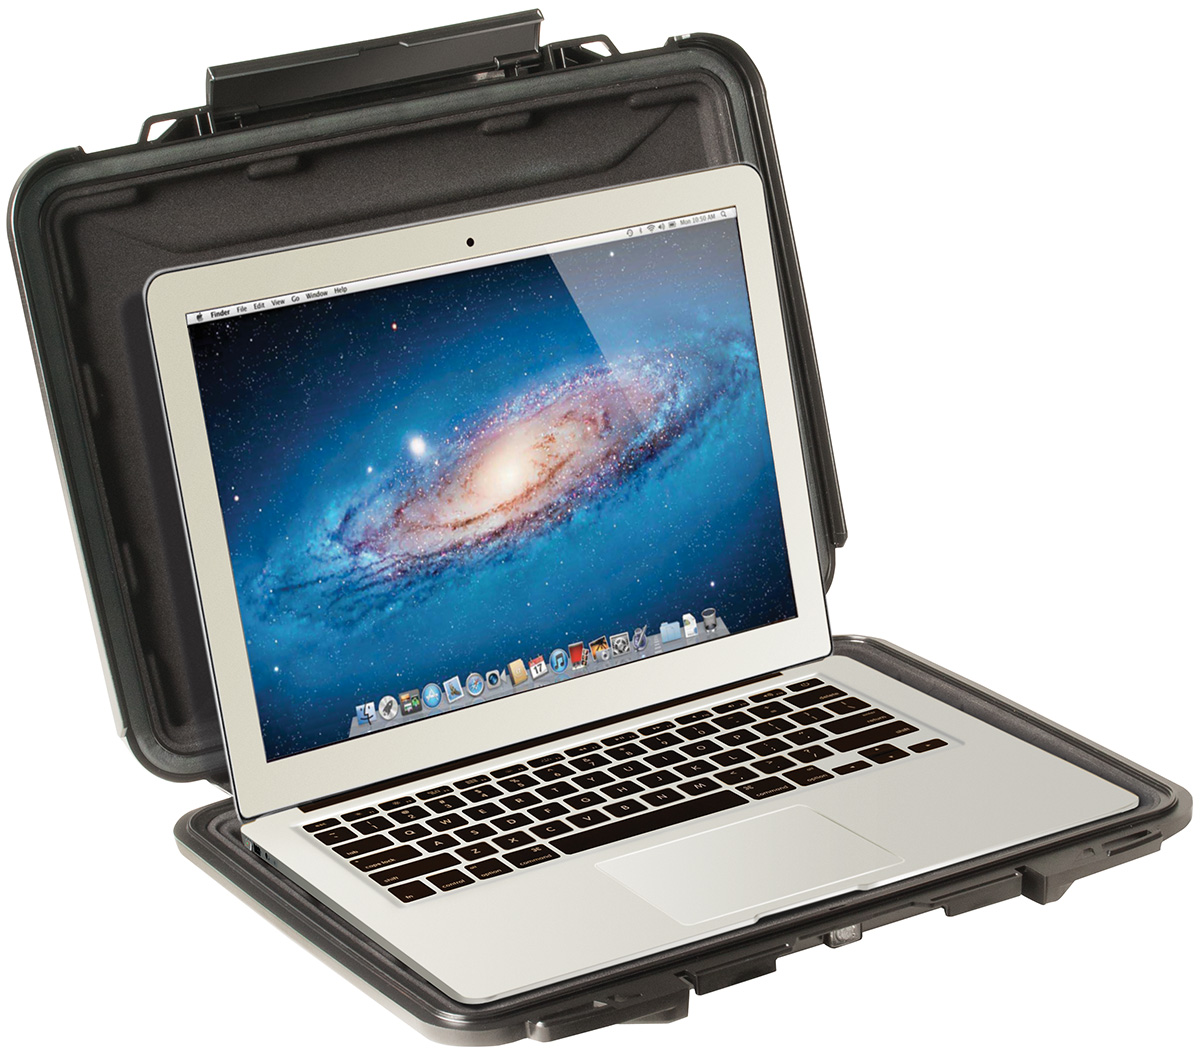 pelican hard macbook air laptop protective case